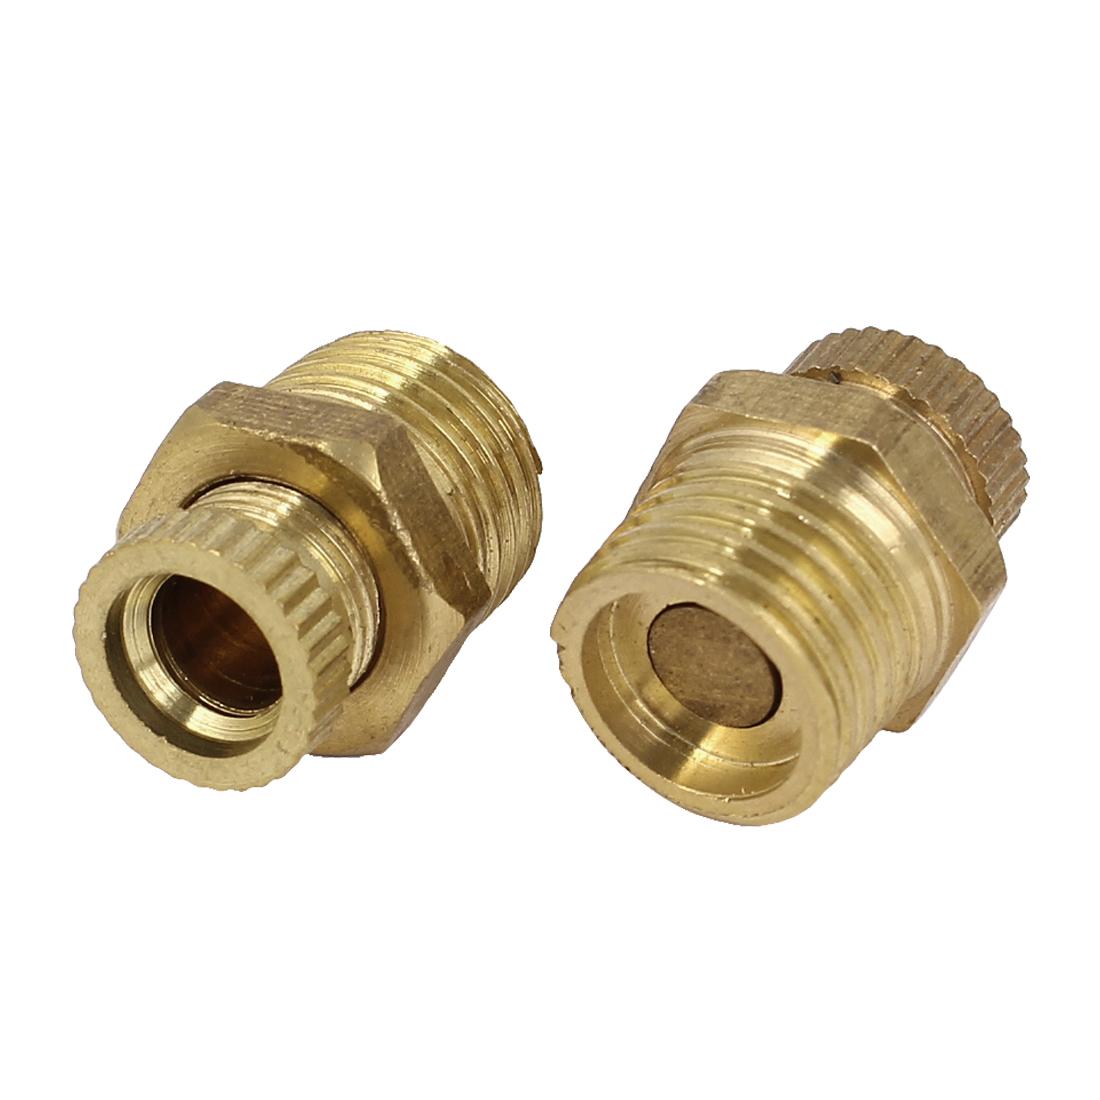 Air Compressor 13mm 1/2BSP Male Thread Water Drain Valve Gold Tone 2 Pcs